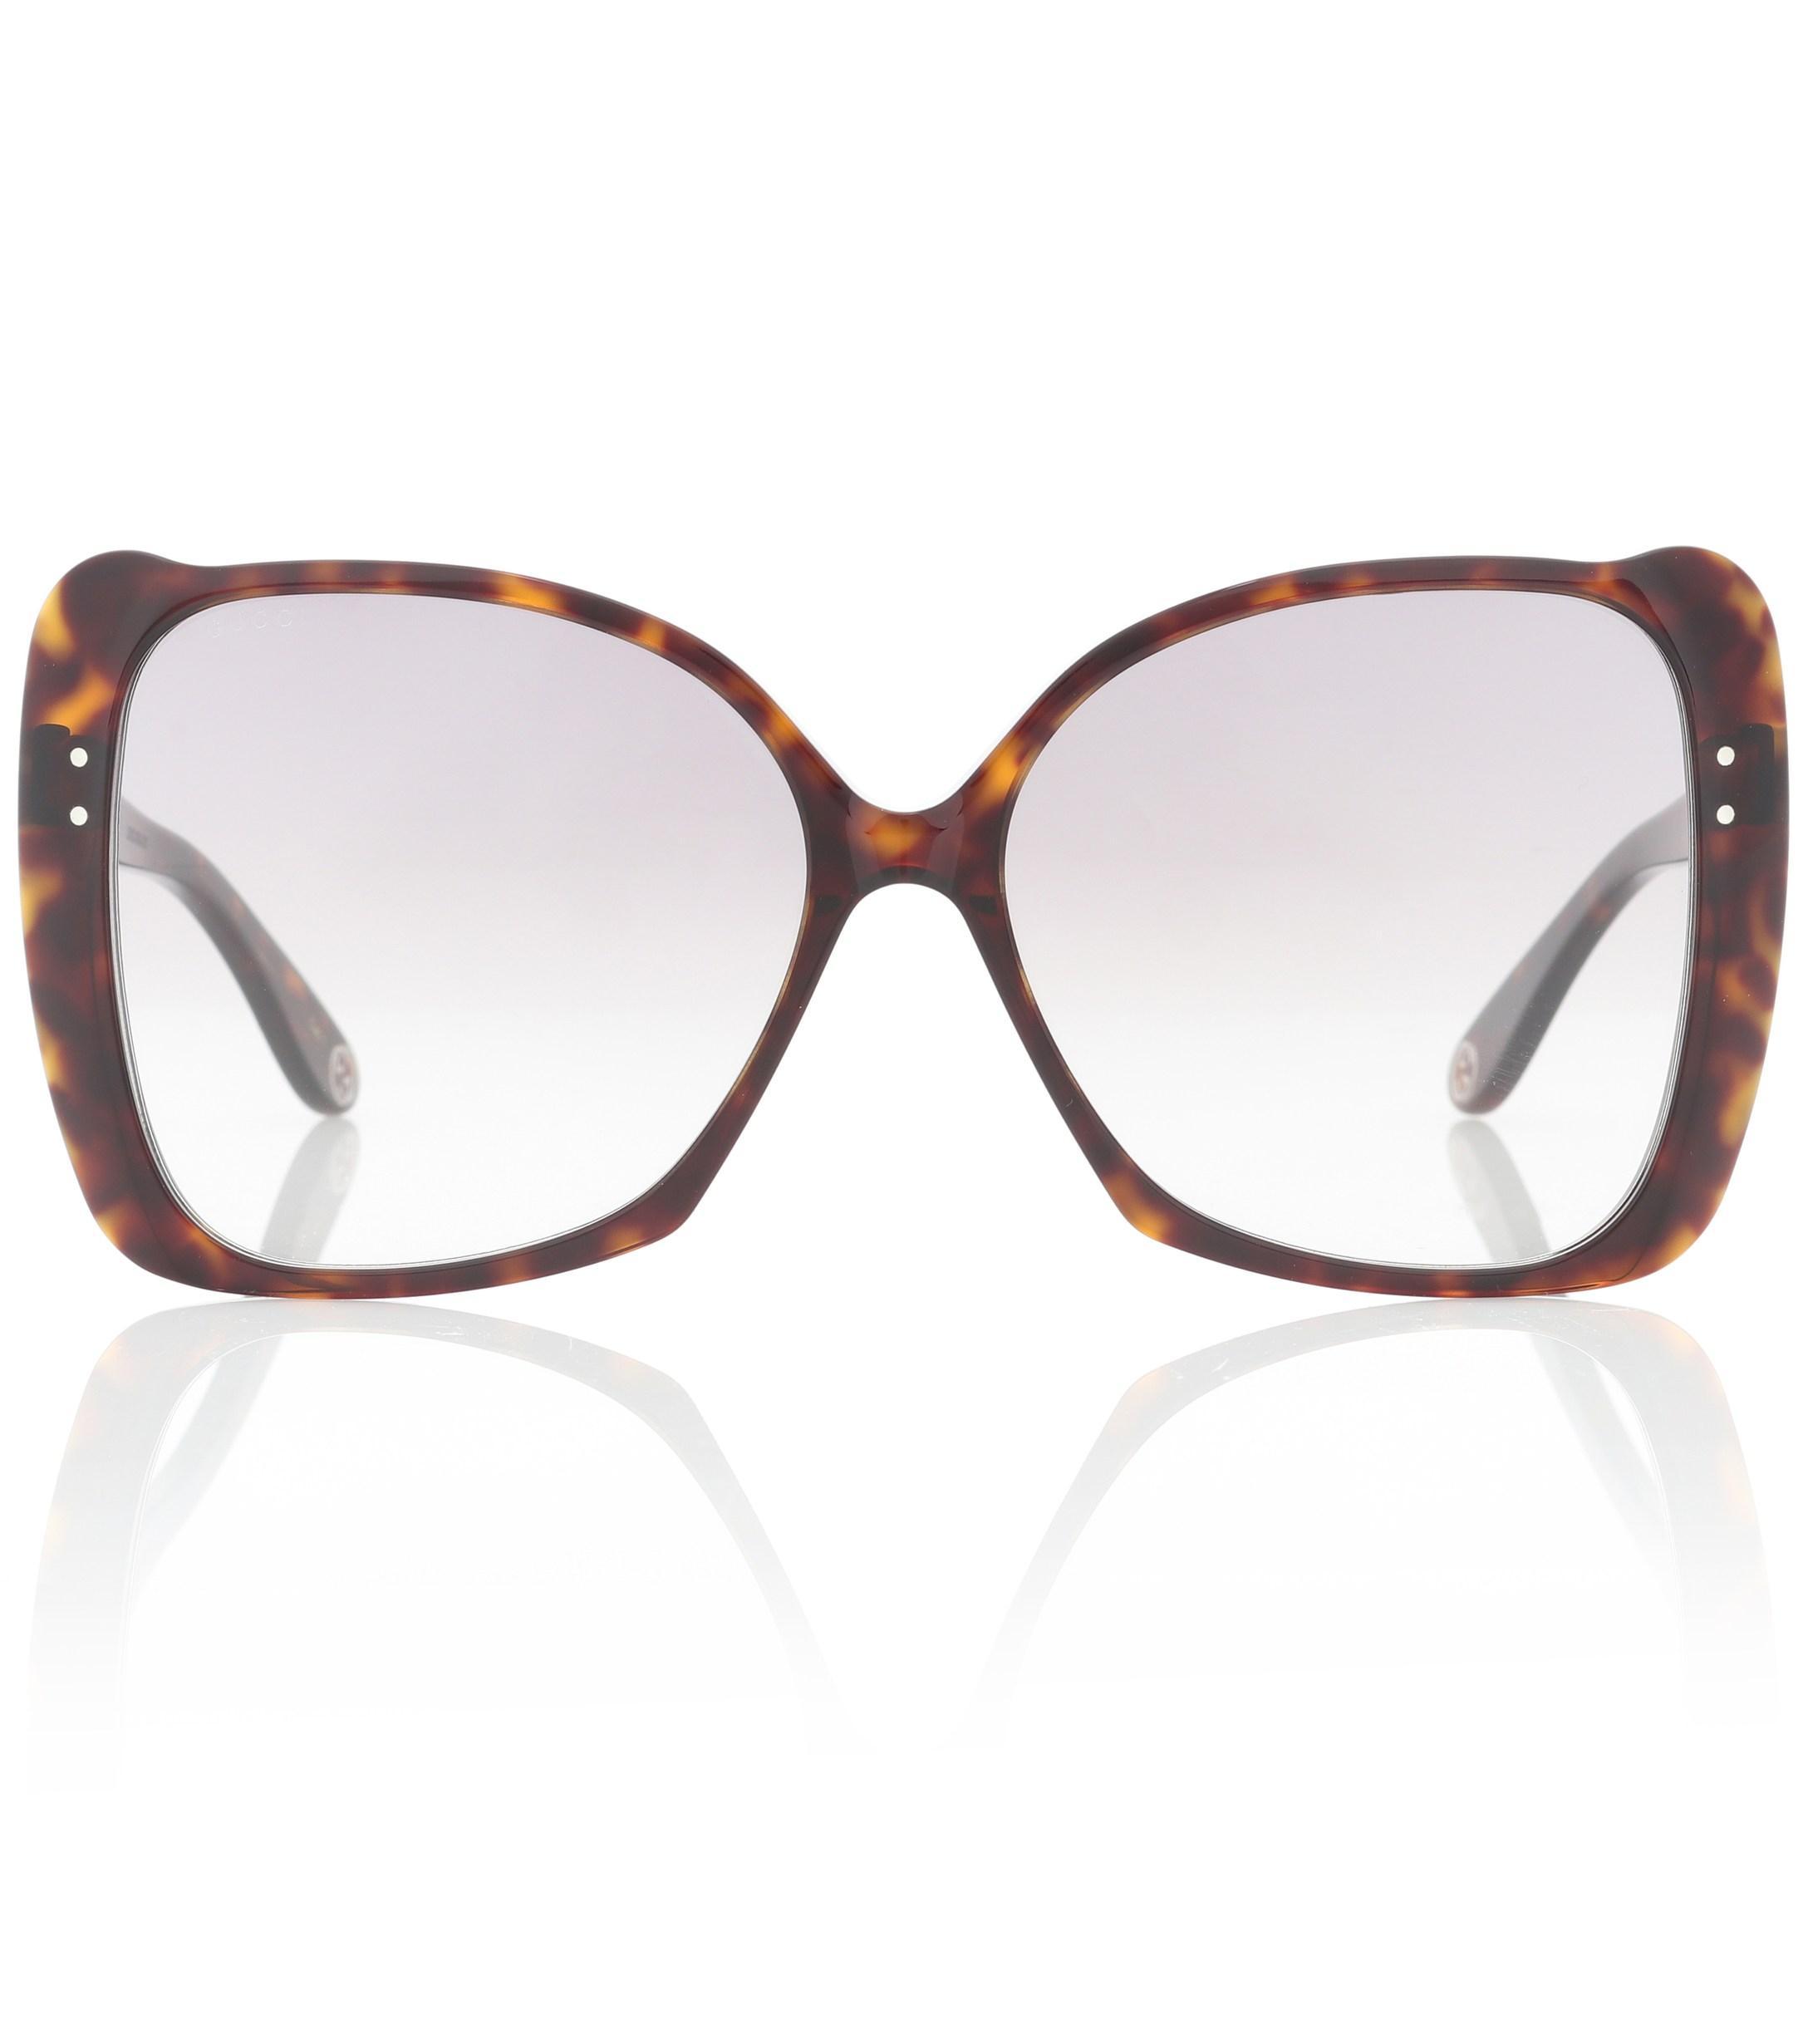 df590171297 Gucci Oversized Square Sunglasses in Brown - Lyst